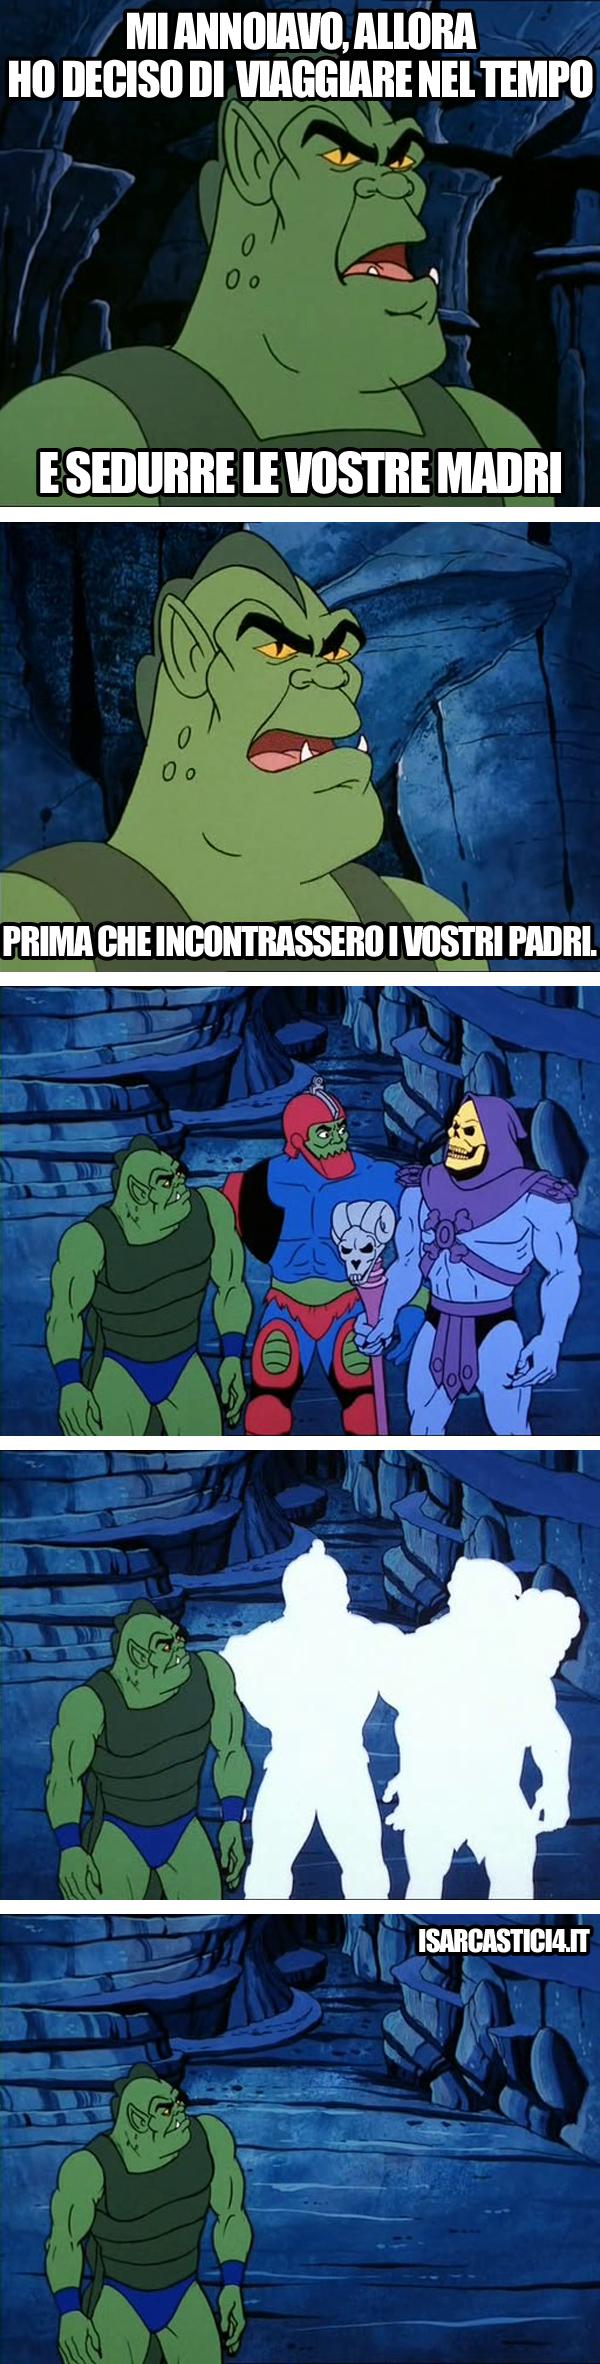 MOTU, Masters Of The Universe meme ita - Paradosso